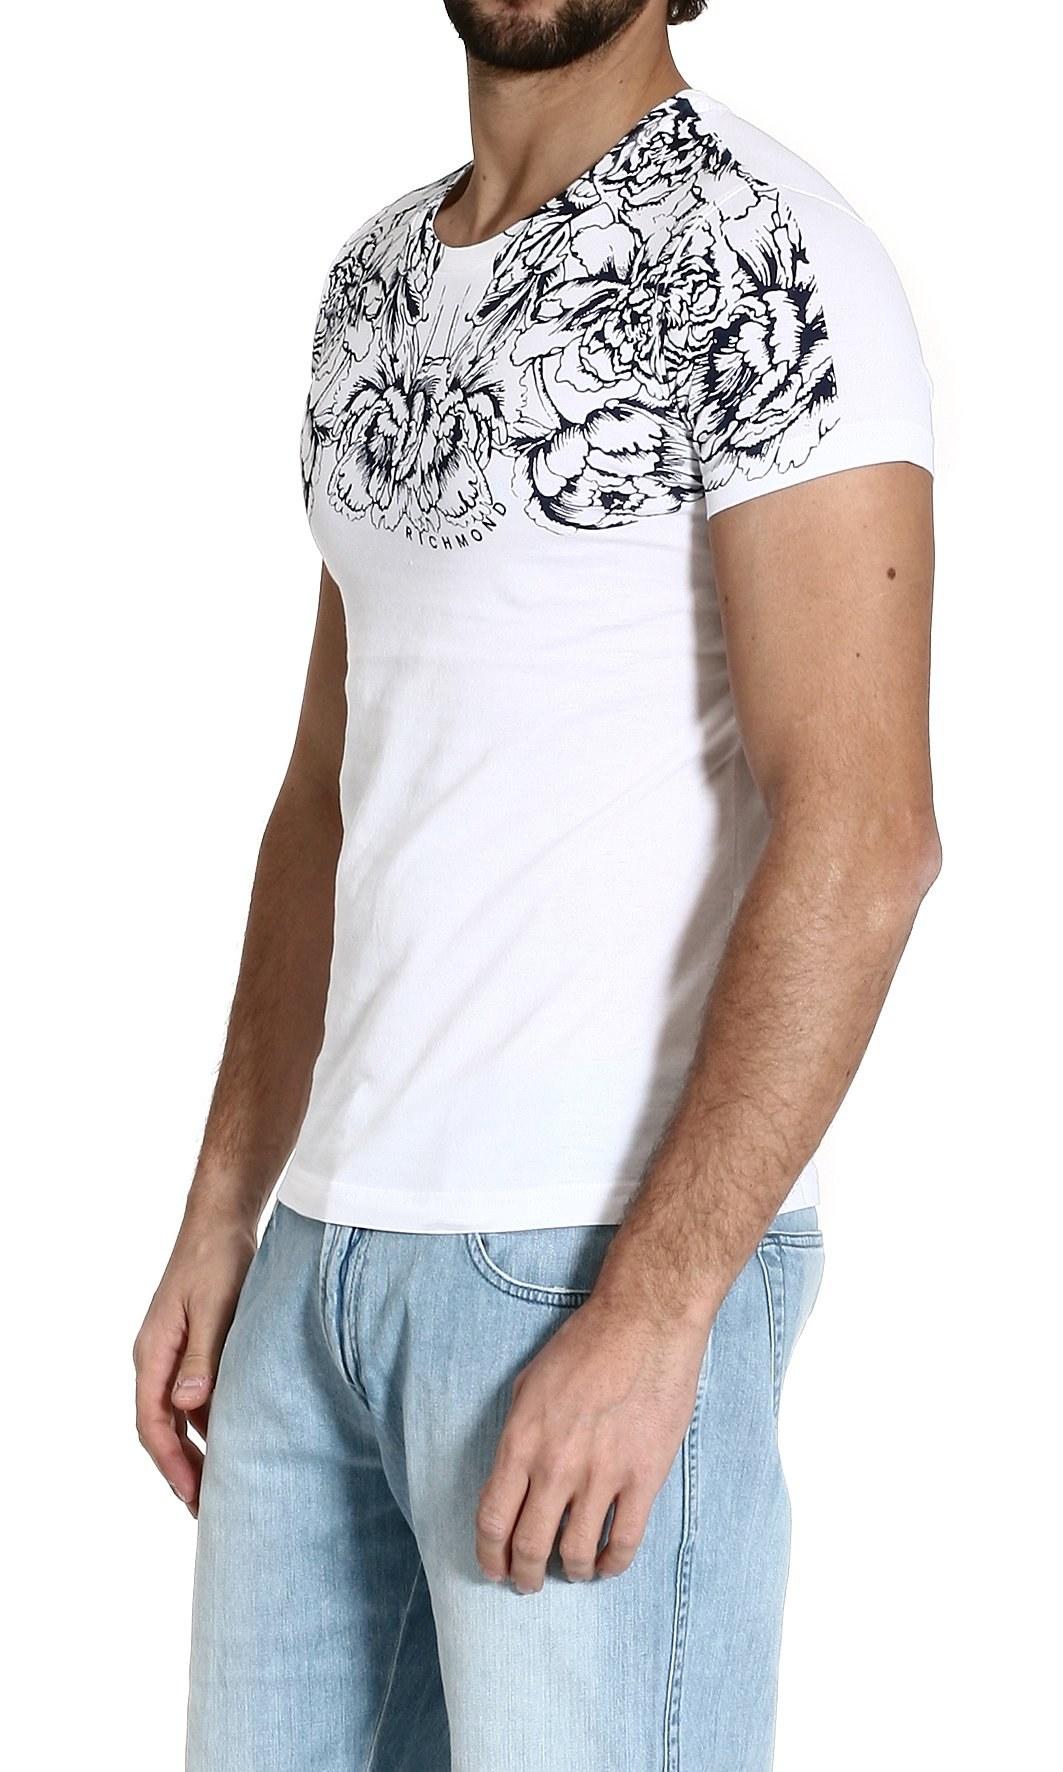 Lyst john richmond tshirt shortsleeve roundneck floral for Richmond t shirt printing